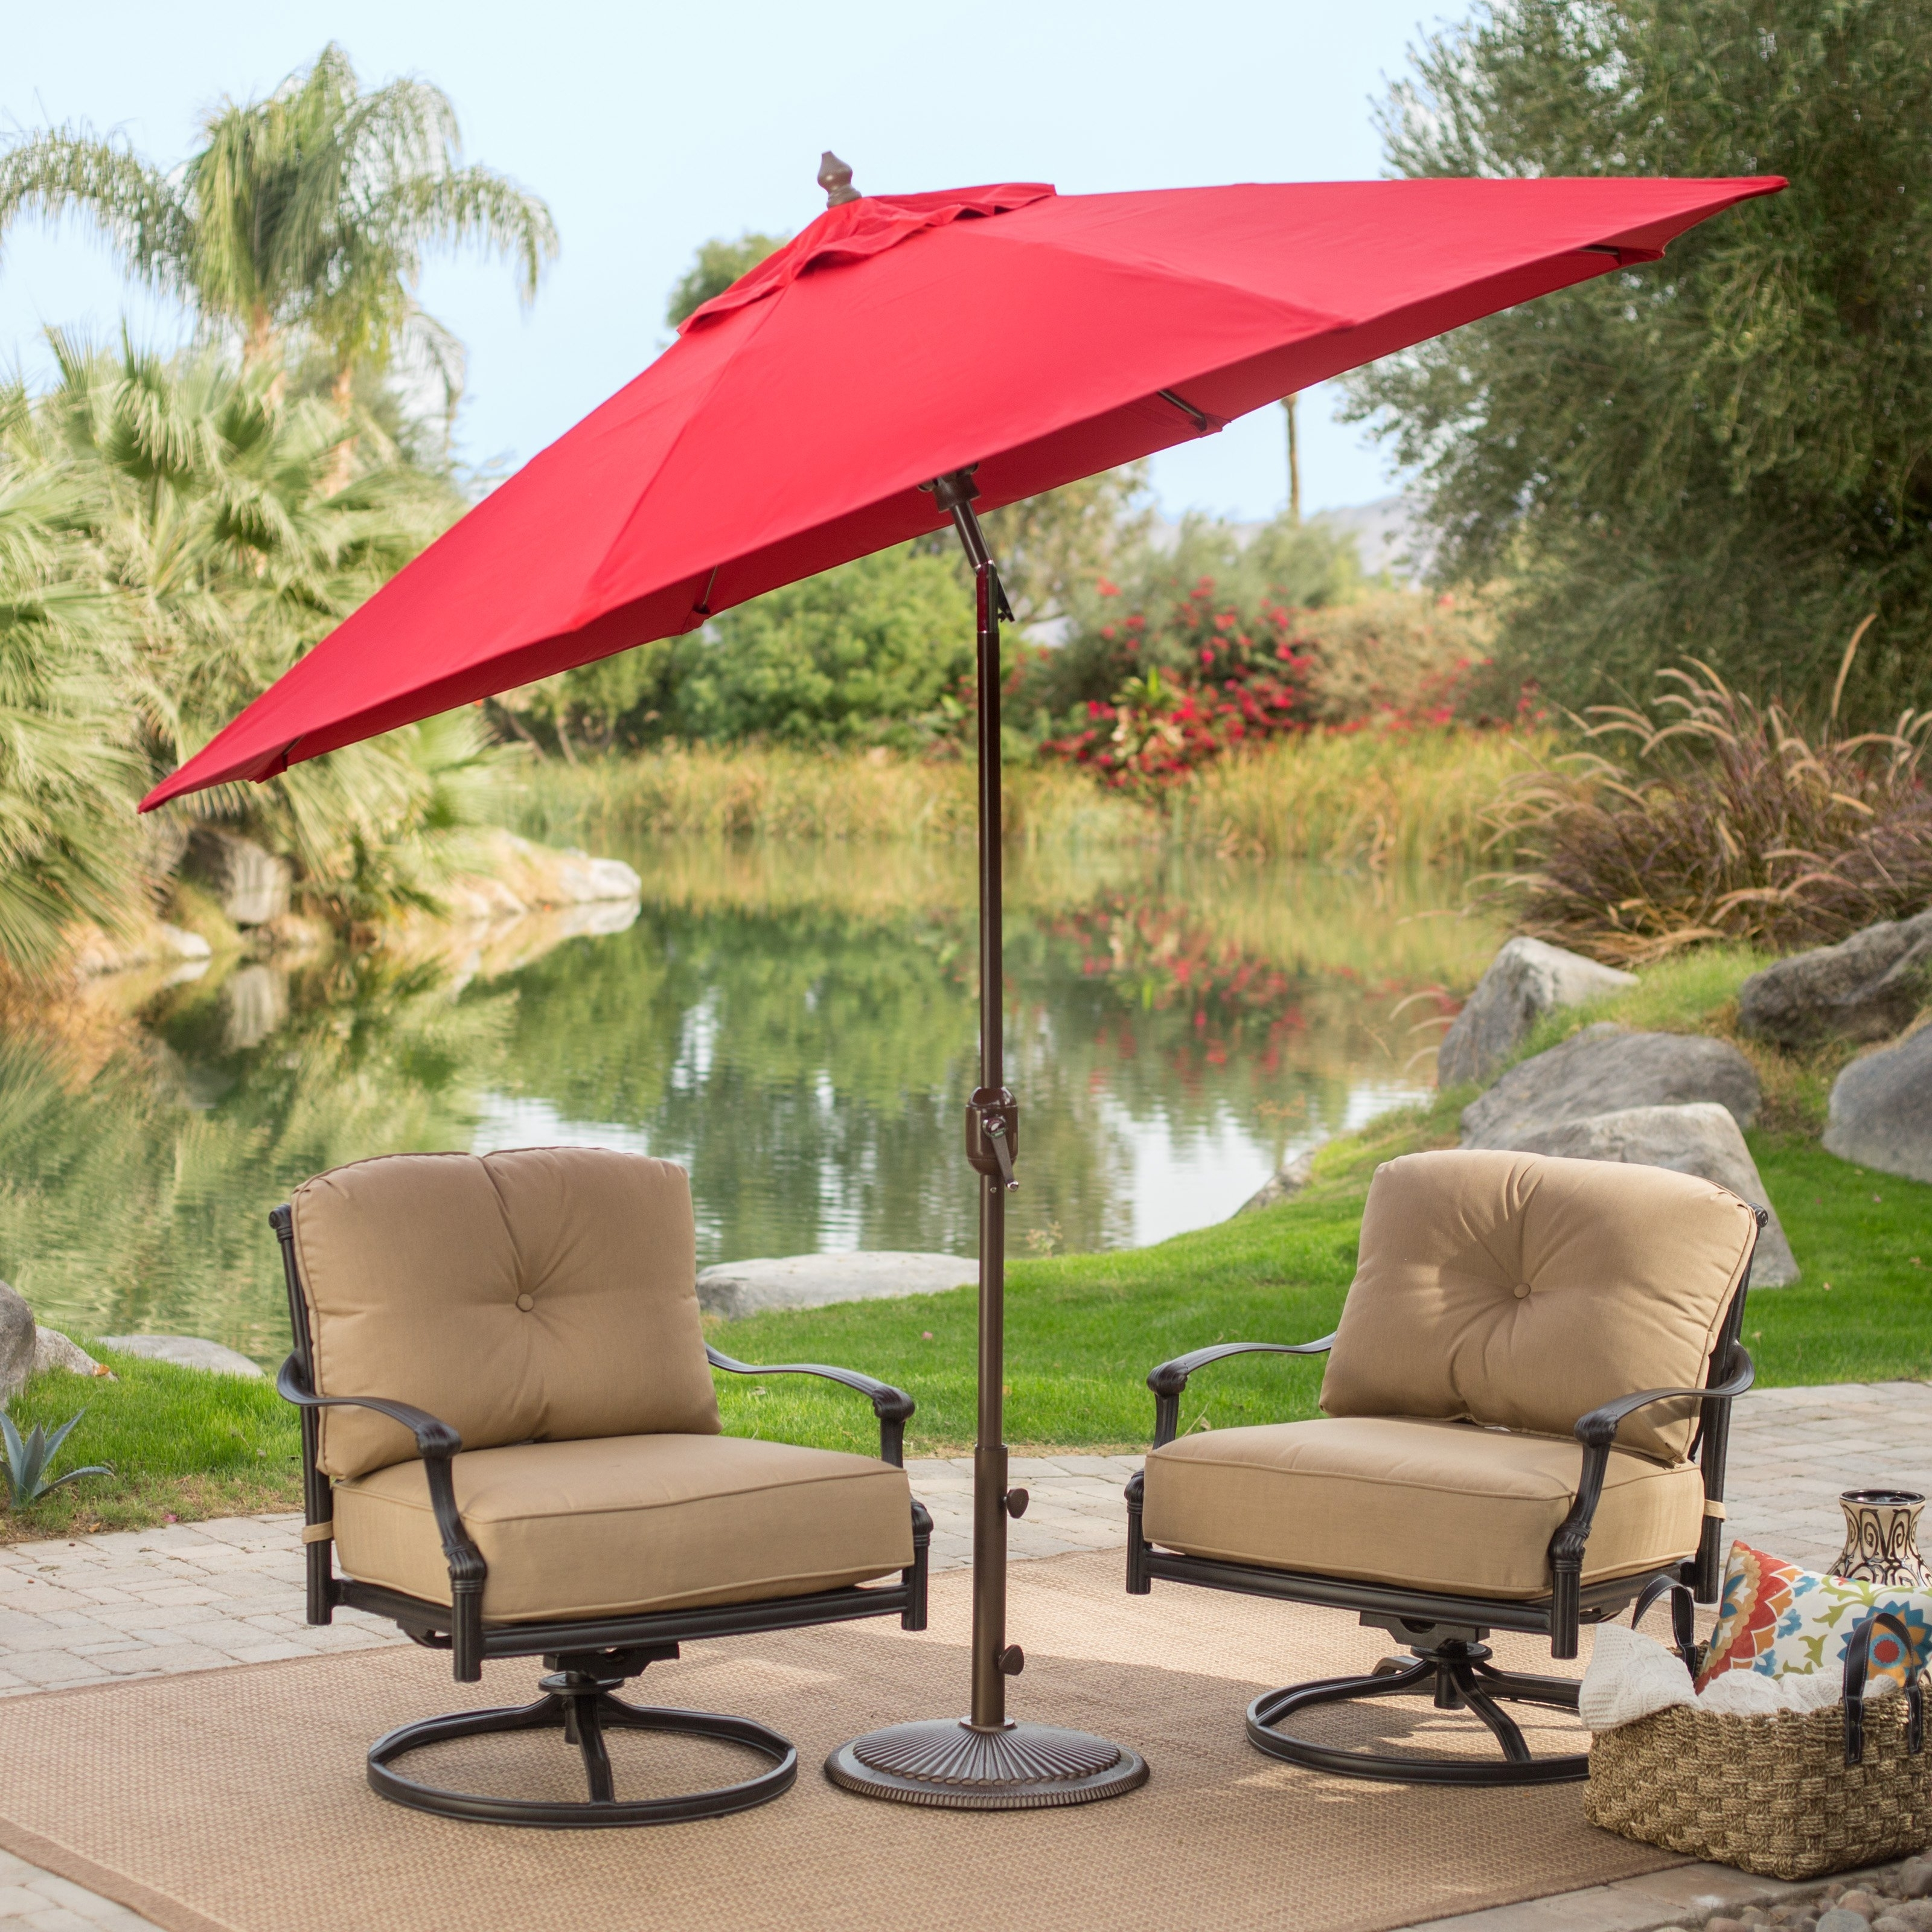 2019 Wind Resistant Patio Umbrellas Pertaining To Patio Umbrella: Best Umbrella For You – Bellissimainteriors (View 14 of 20)